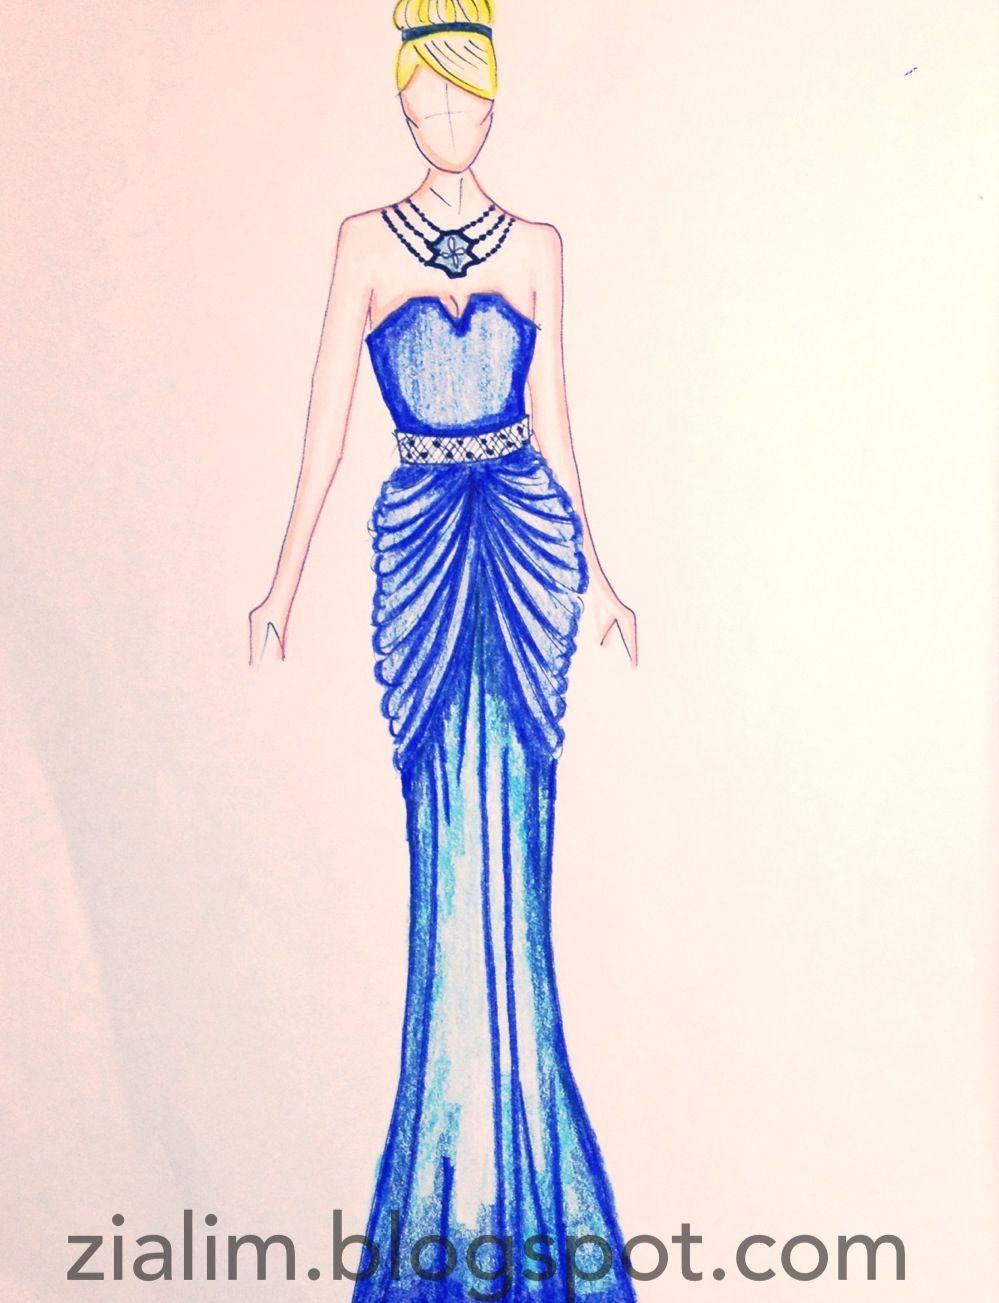 Fashion sketches colored pencils 23